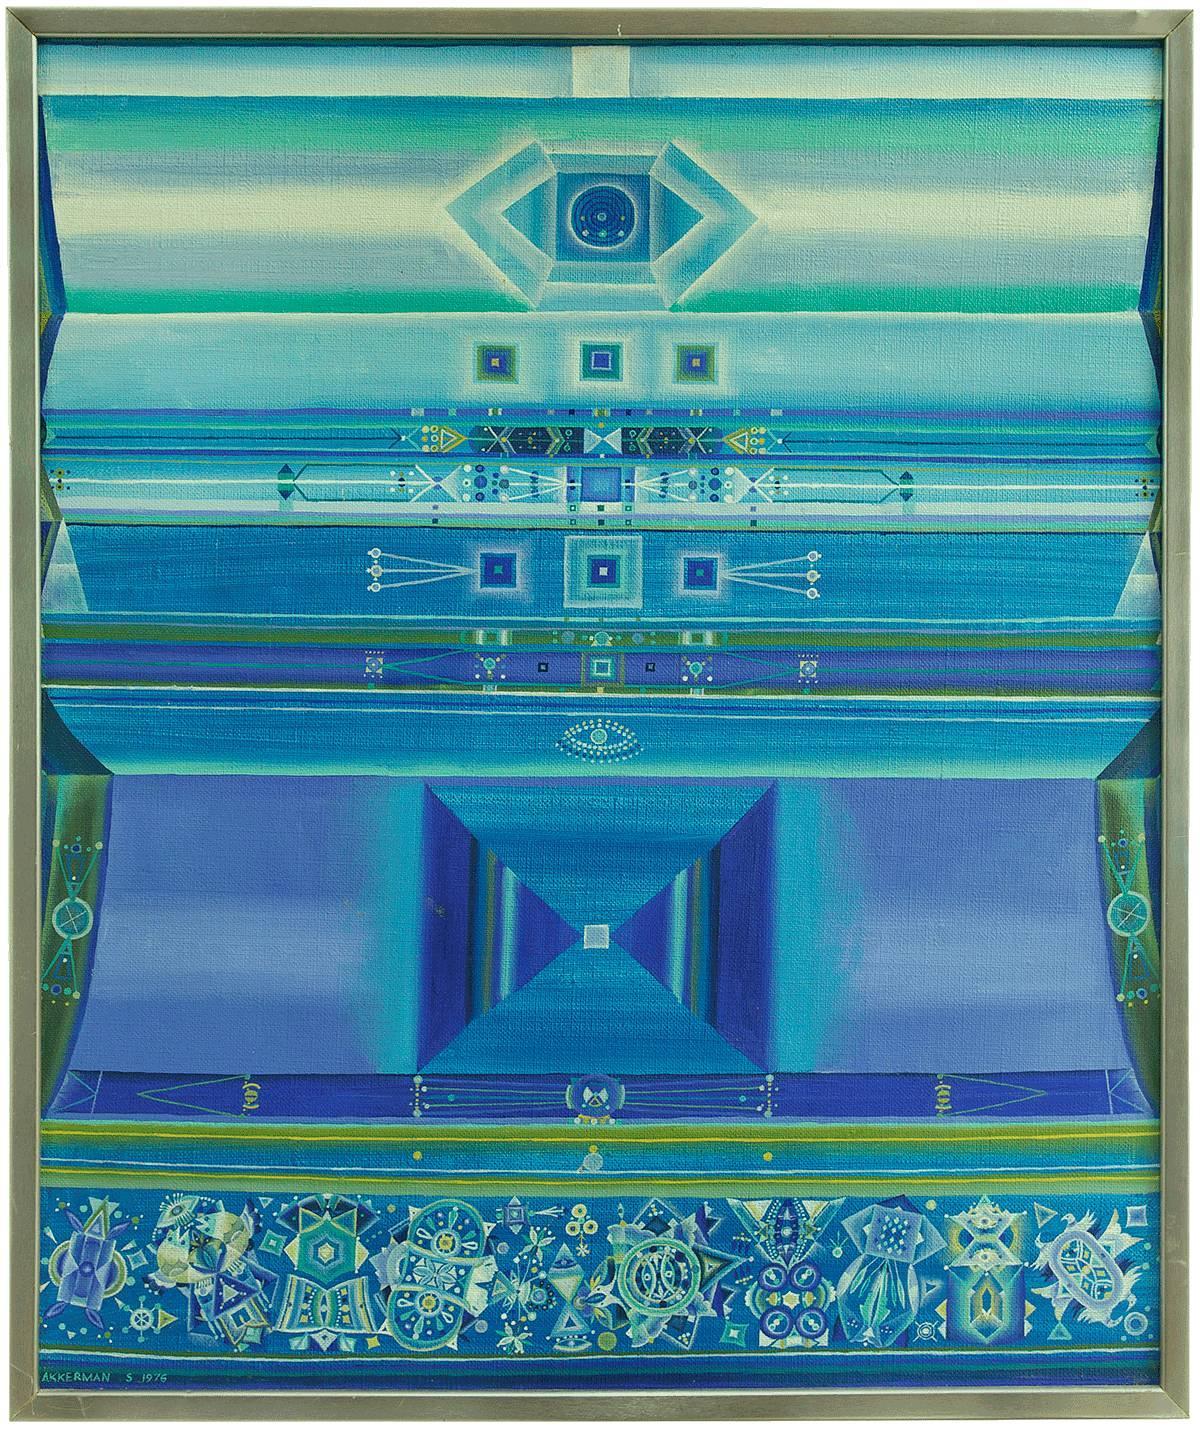 Celestial Fields Post Soviet Avant Garde Russian Israeli Art, Leviathan Group